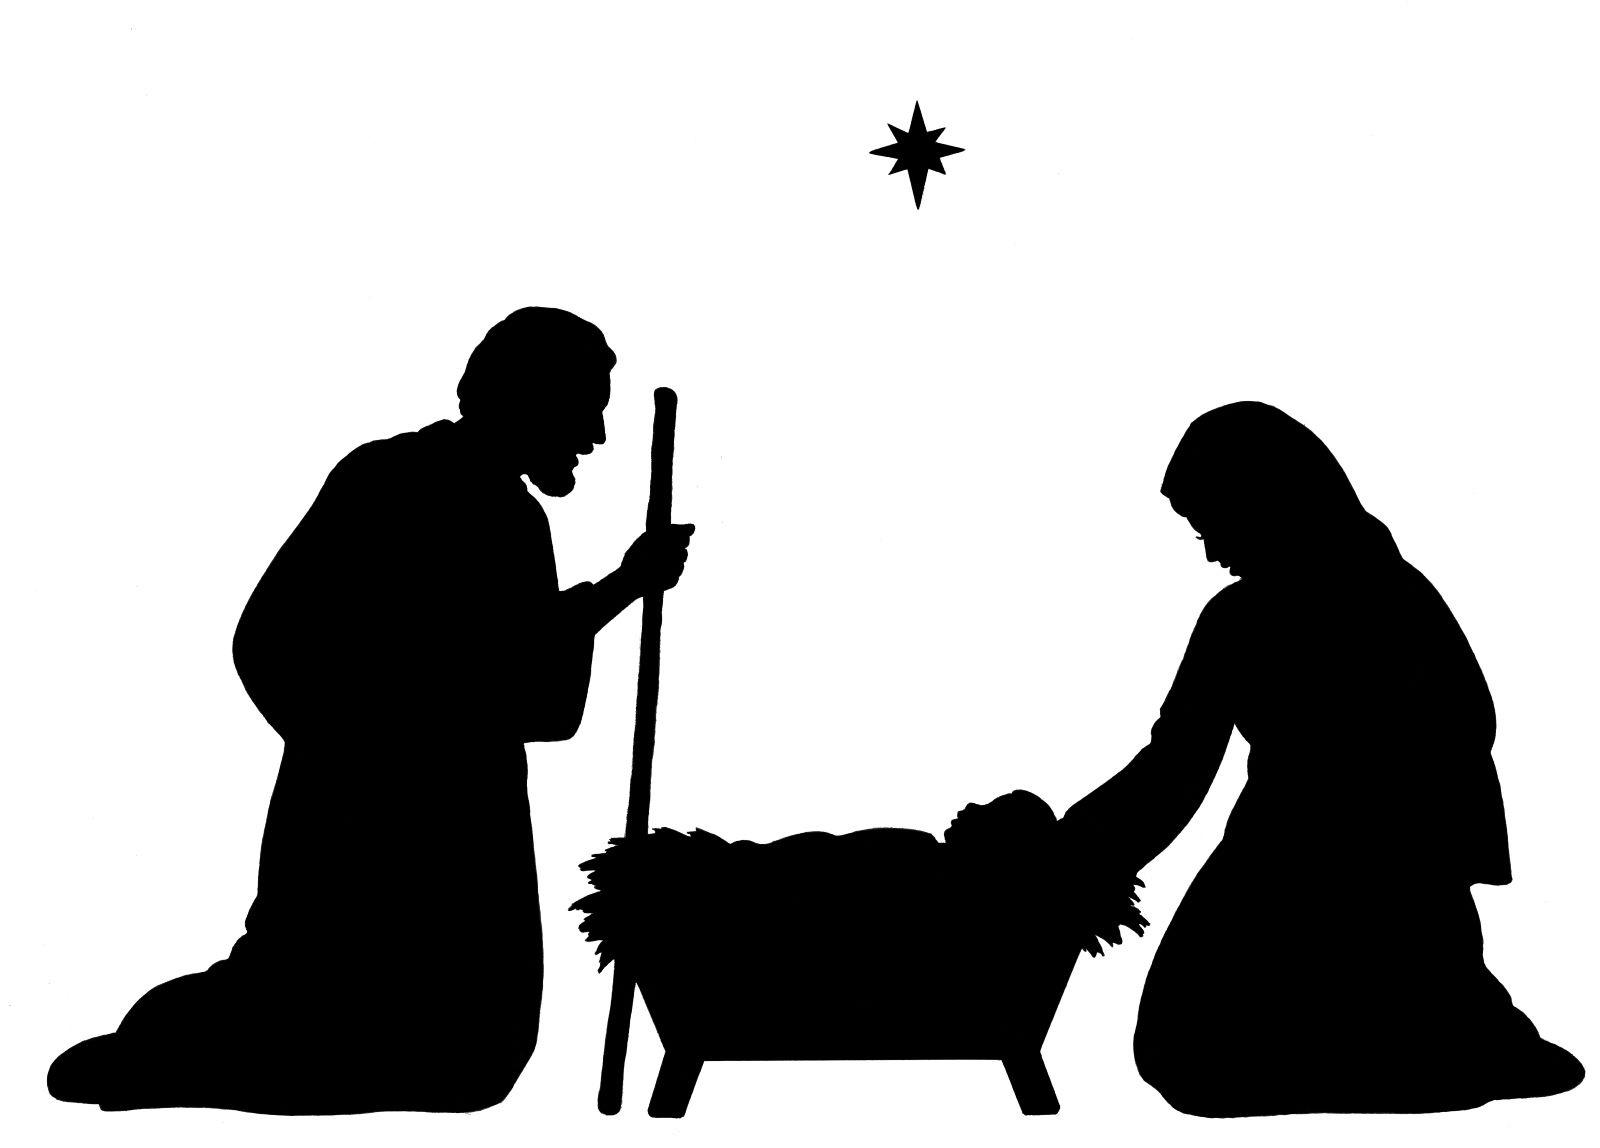 Baby Jesus Silhouette | Nativity Silhouette Clip Art | + Black - Free Printable Nativity Silhouette